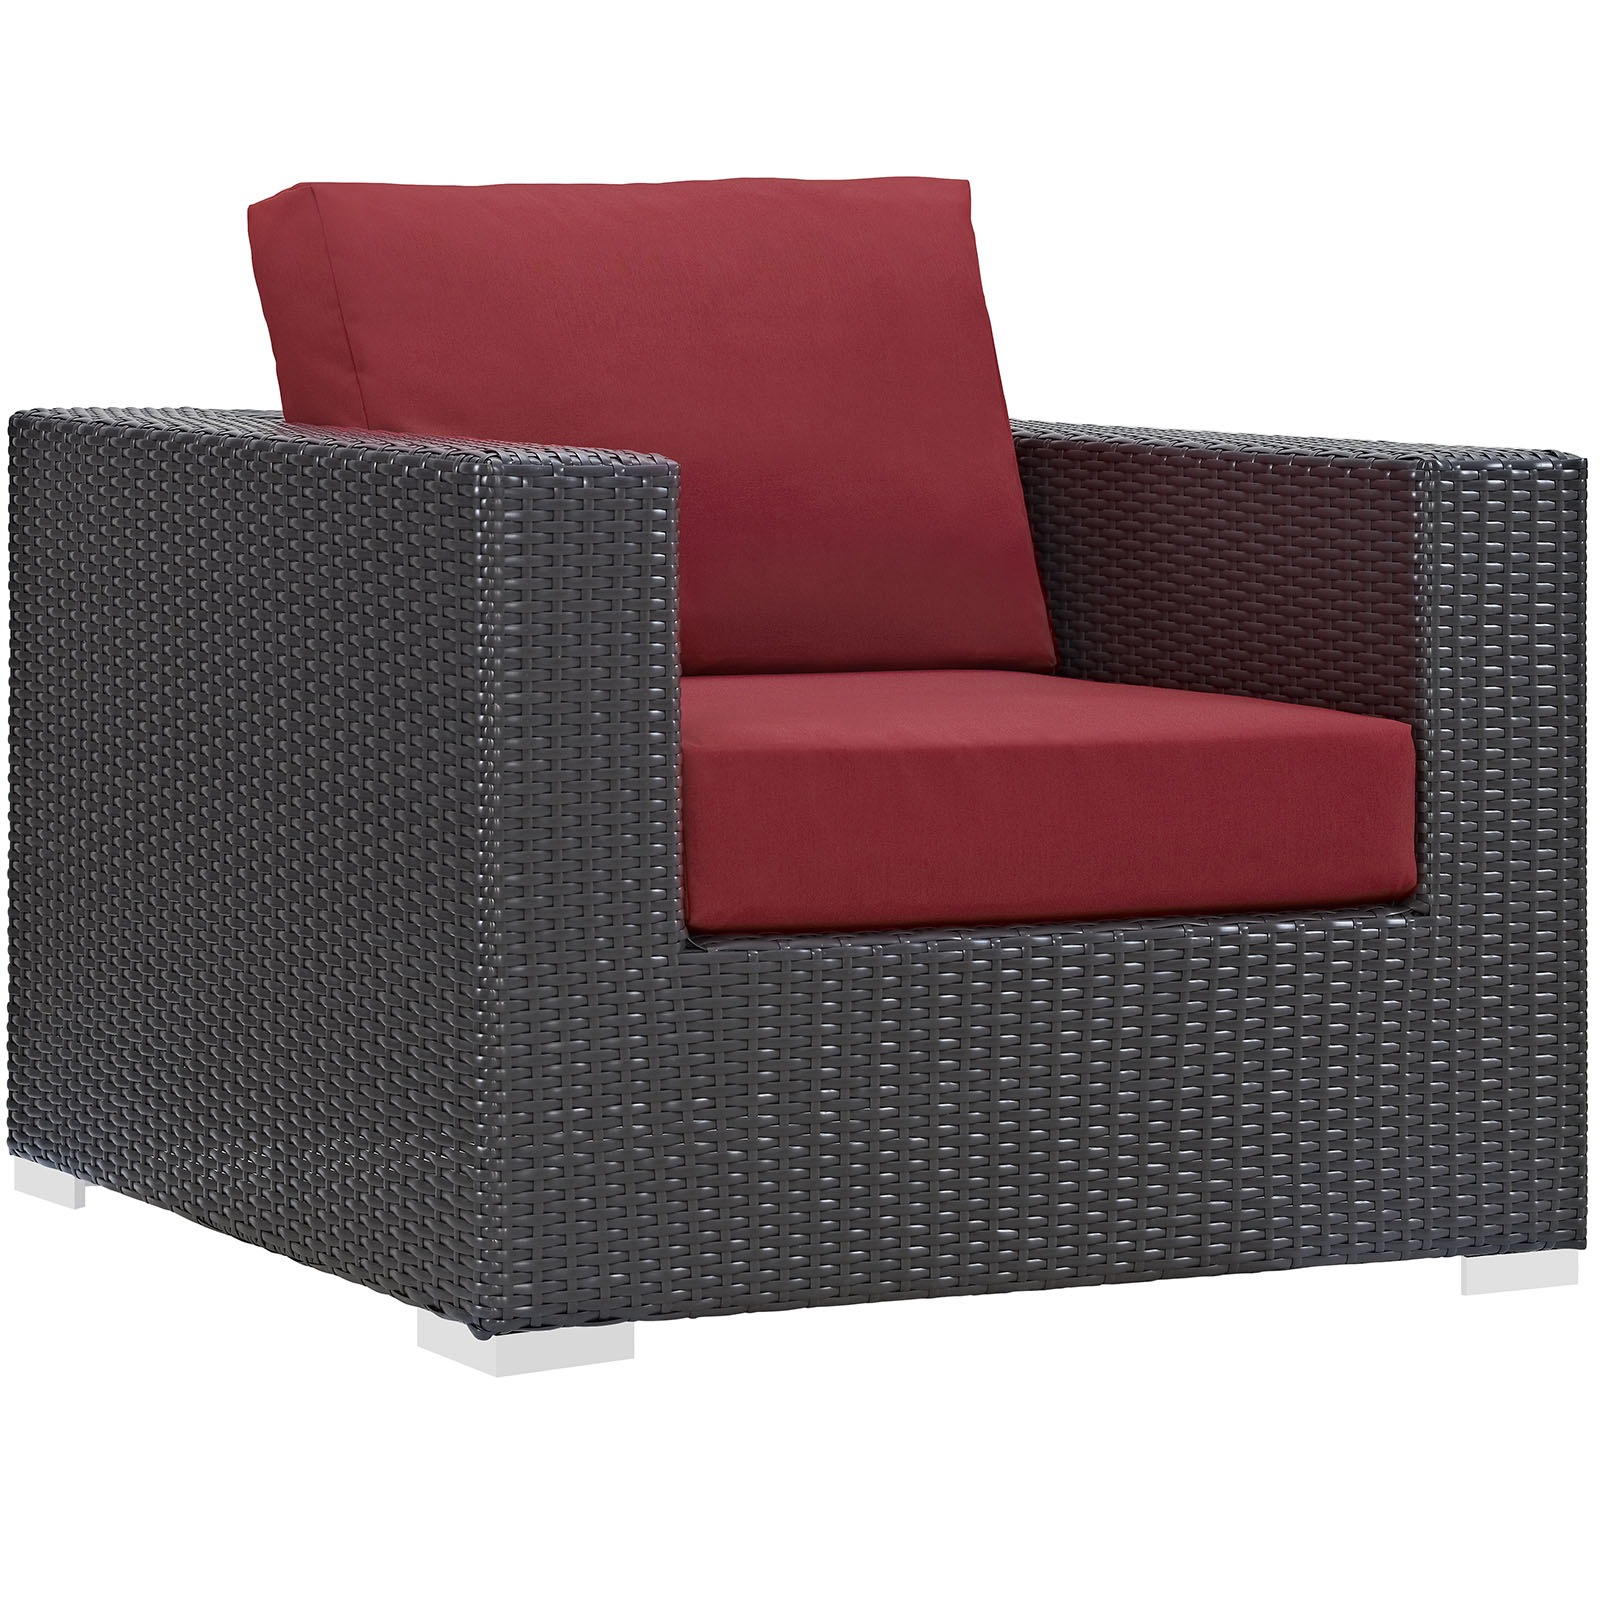 Modern Contemporary Urban Design Outdoor Patio Balcony Lounge Chair, Red, Rattan